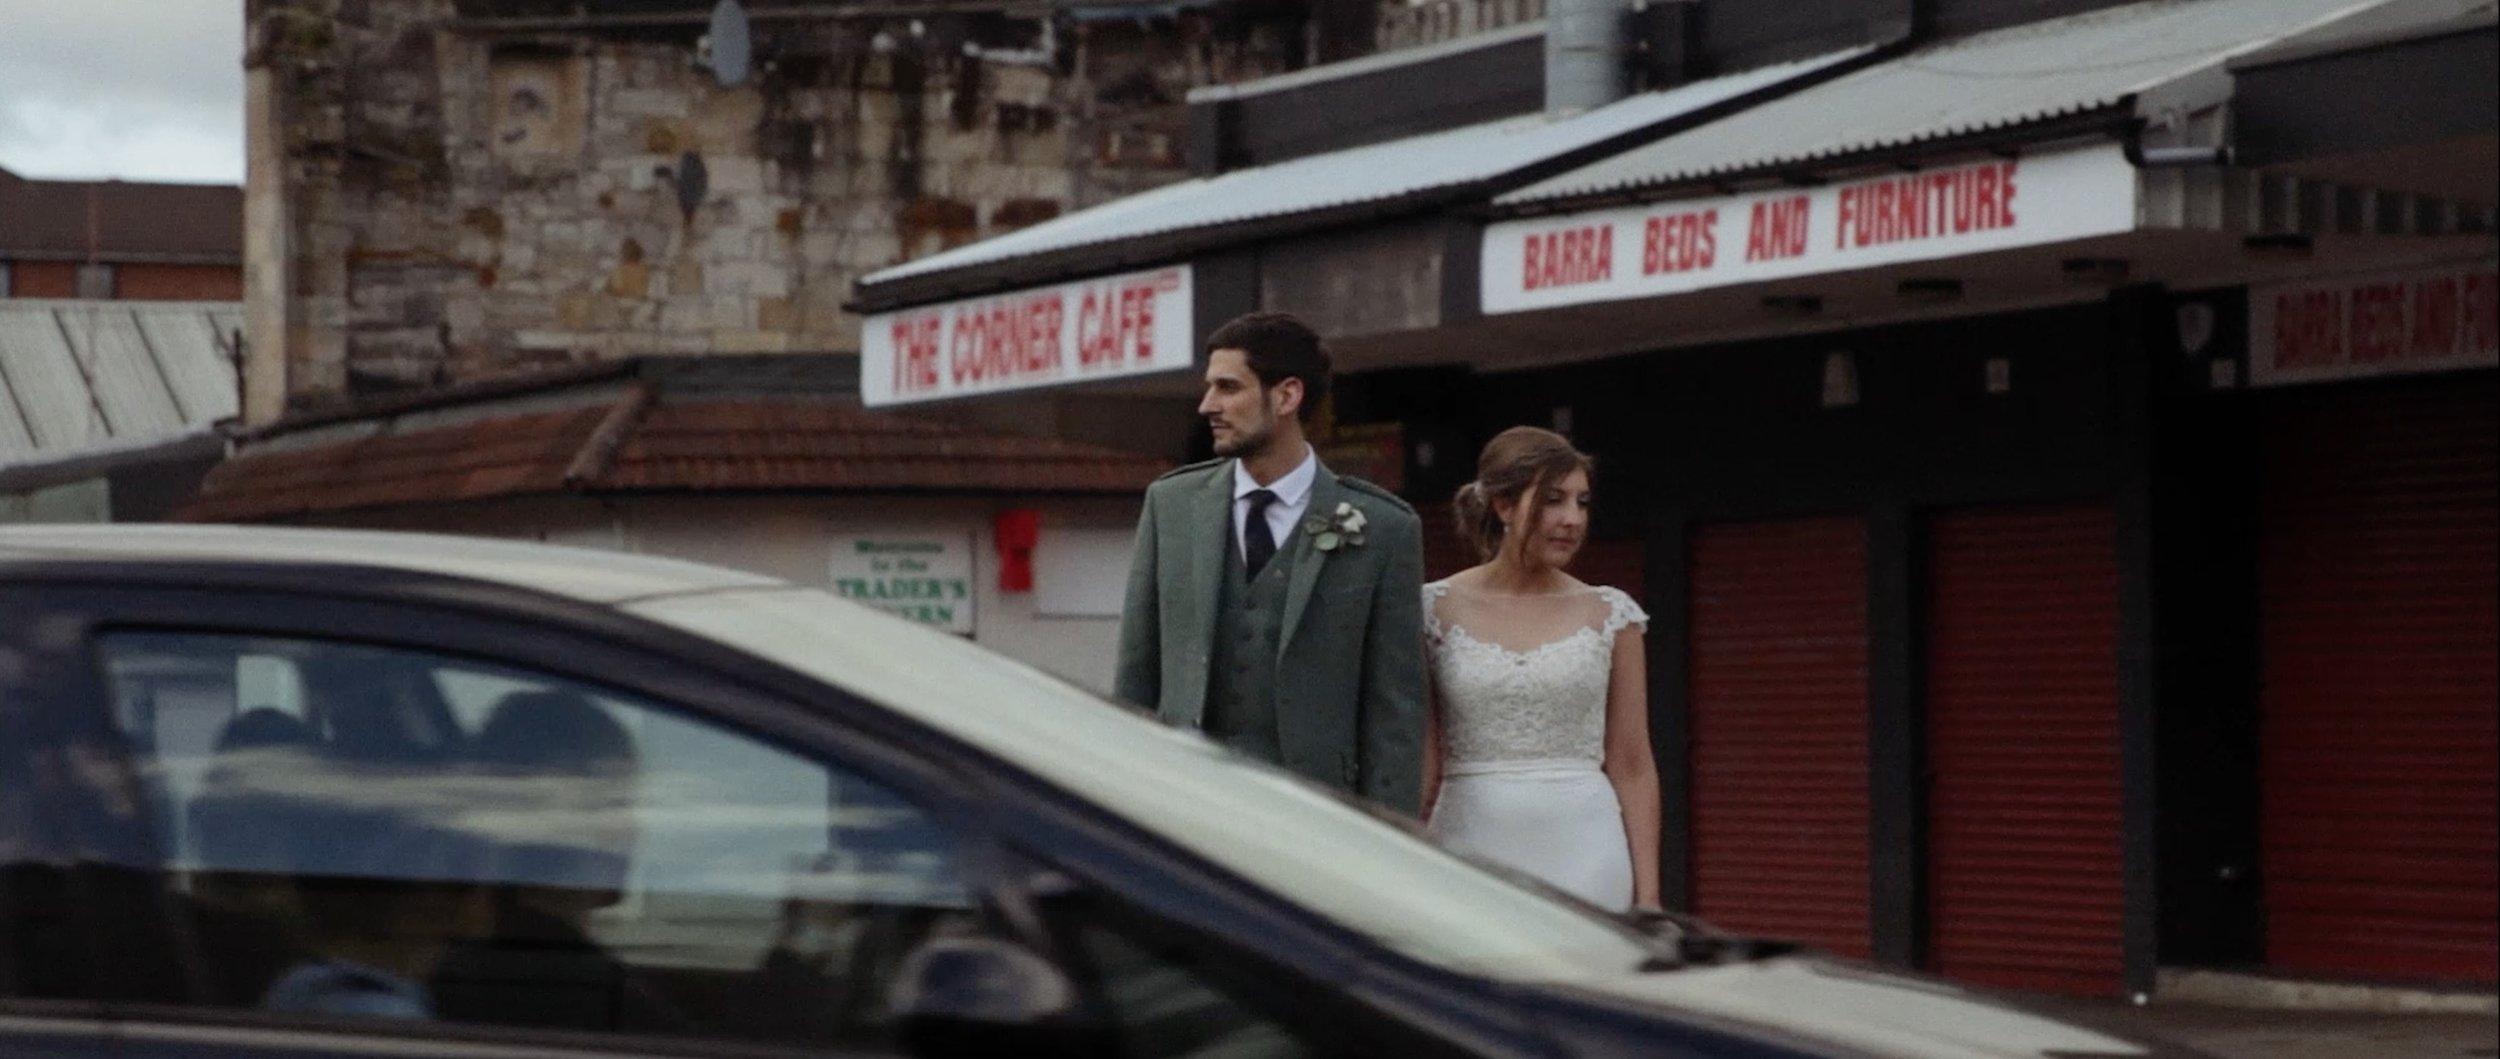 st-andrews-wedding-videographer_LL_05.jpg